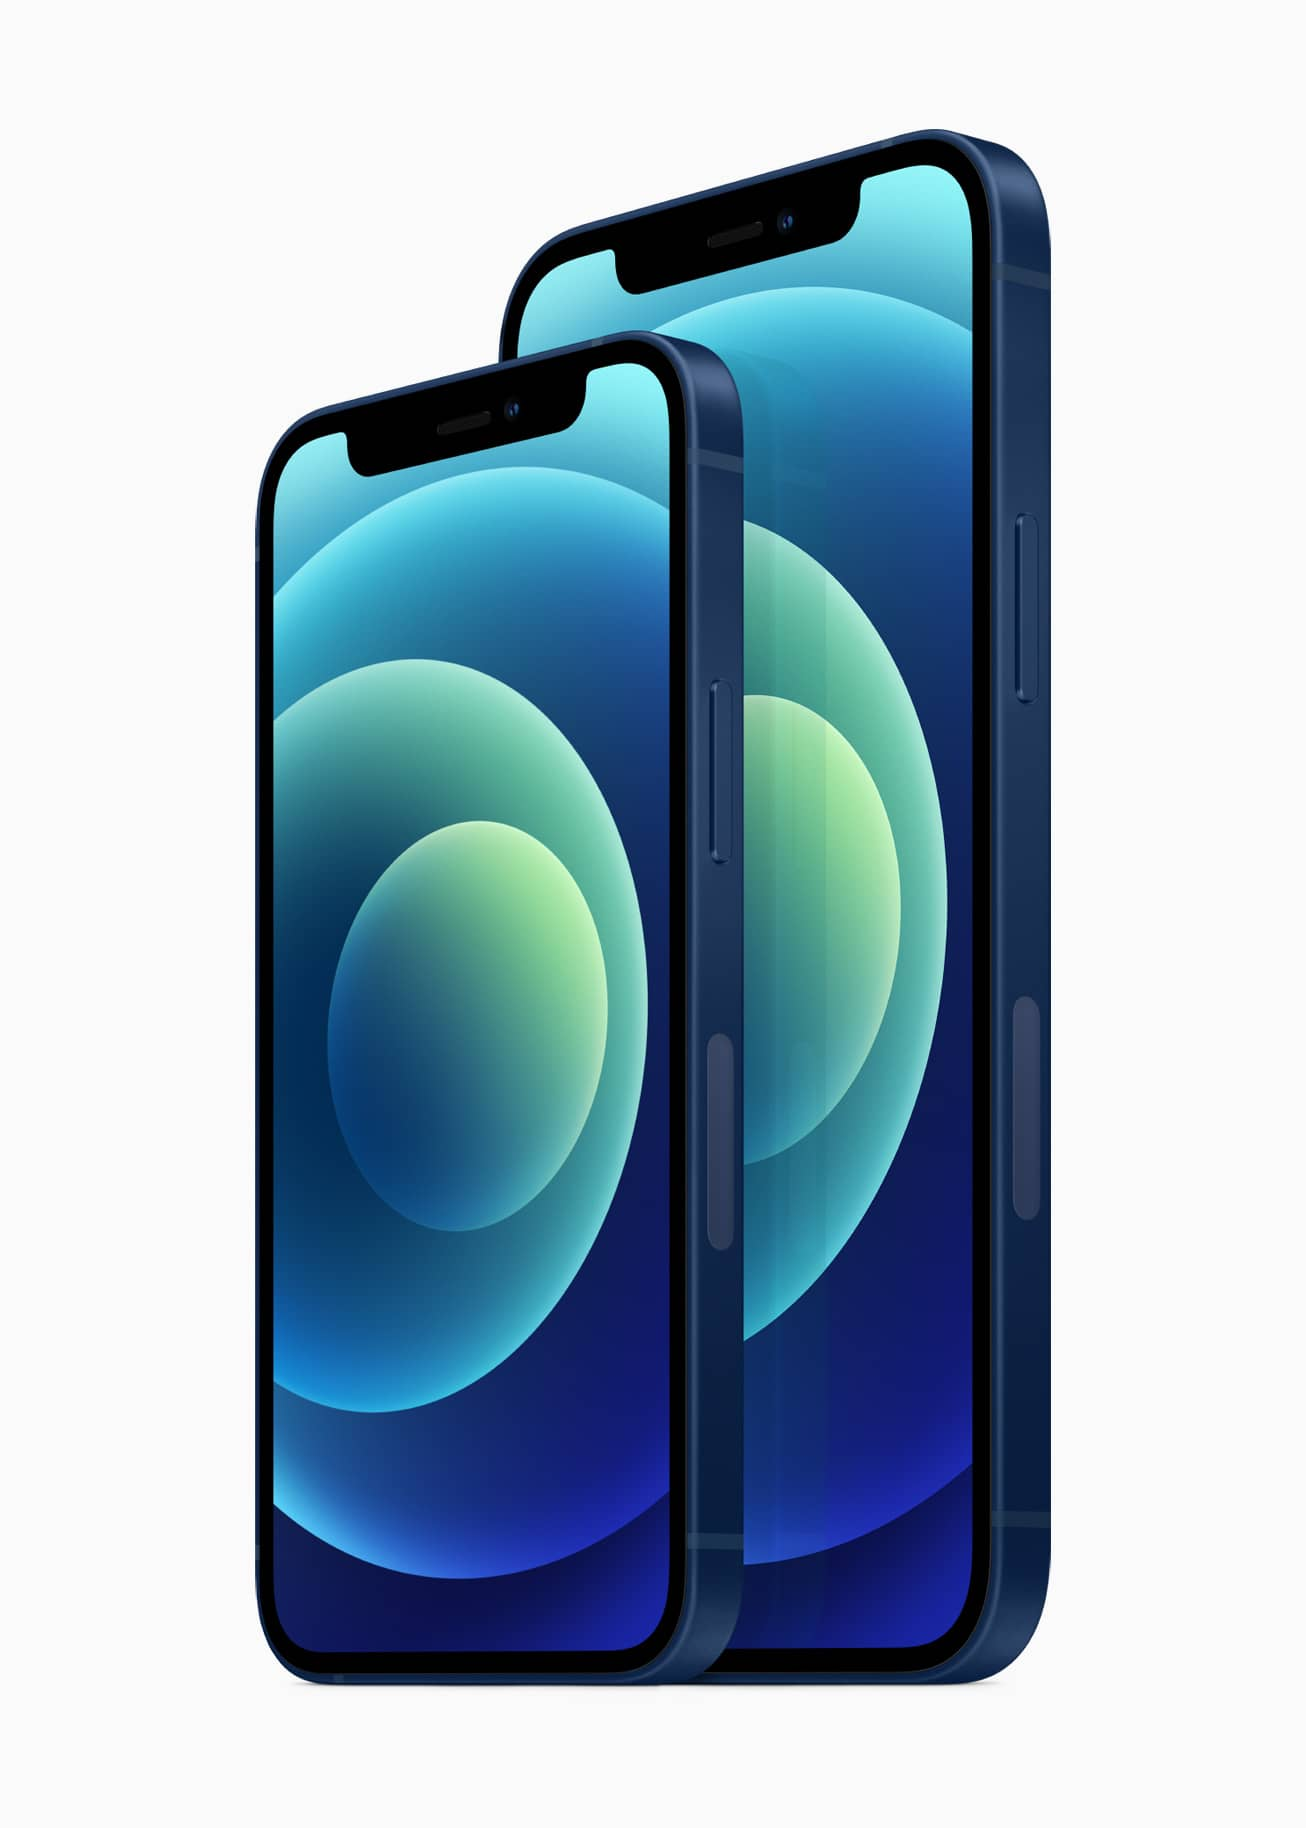 apple iphone 12 2 up 10132020